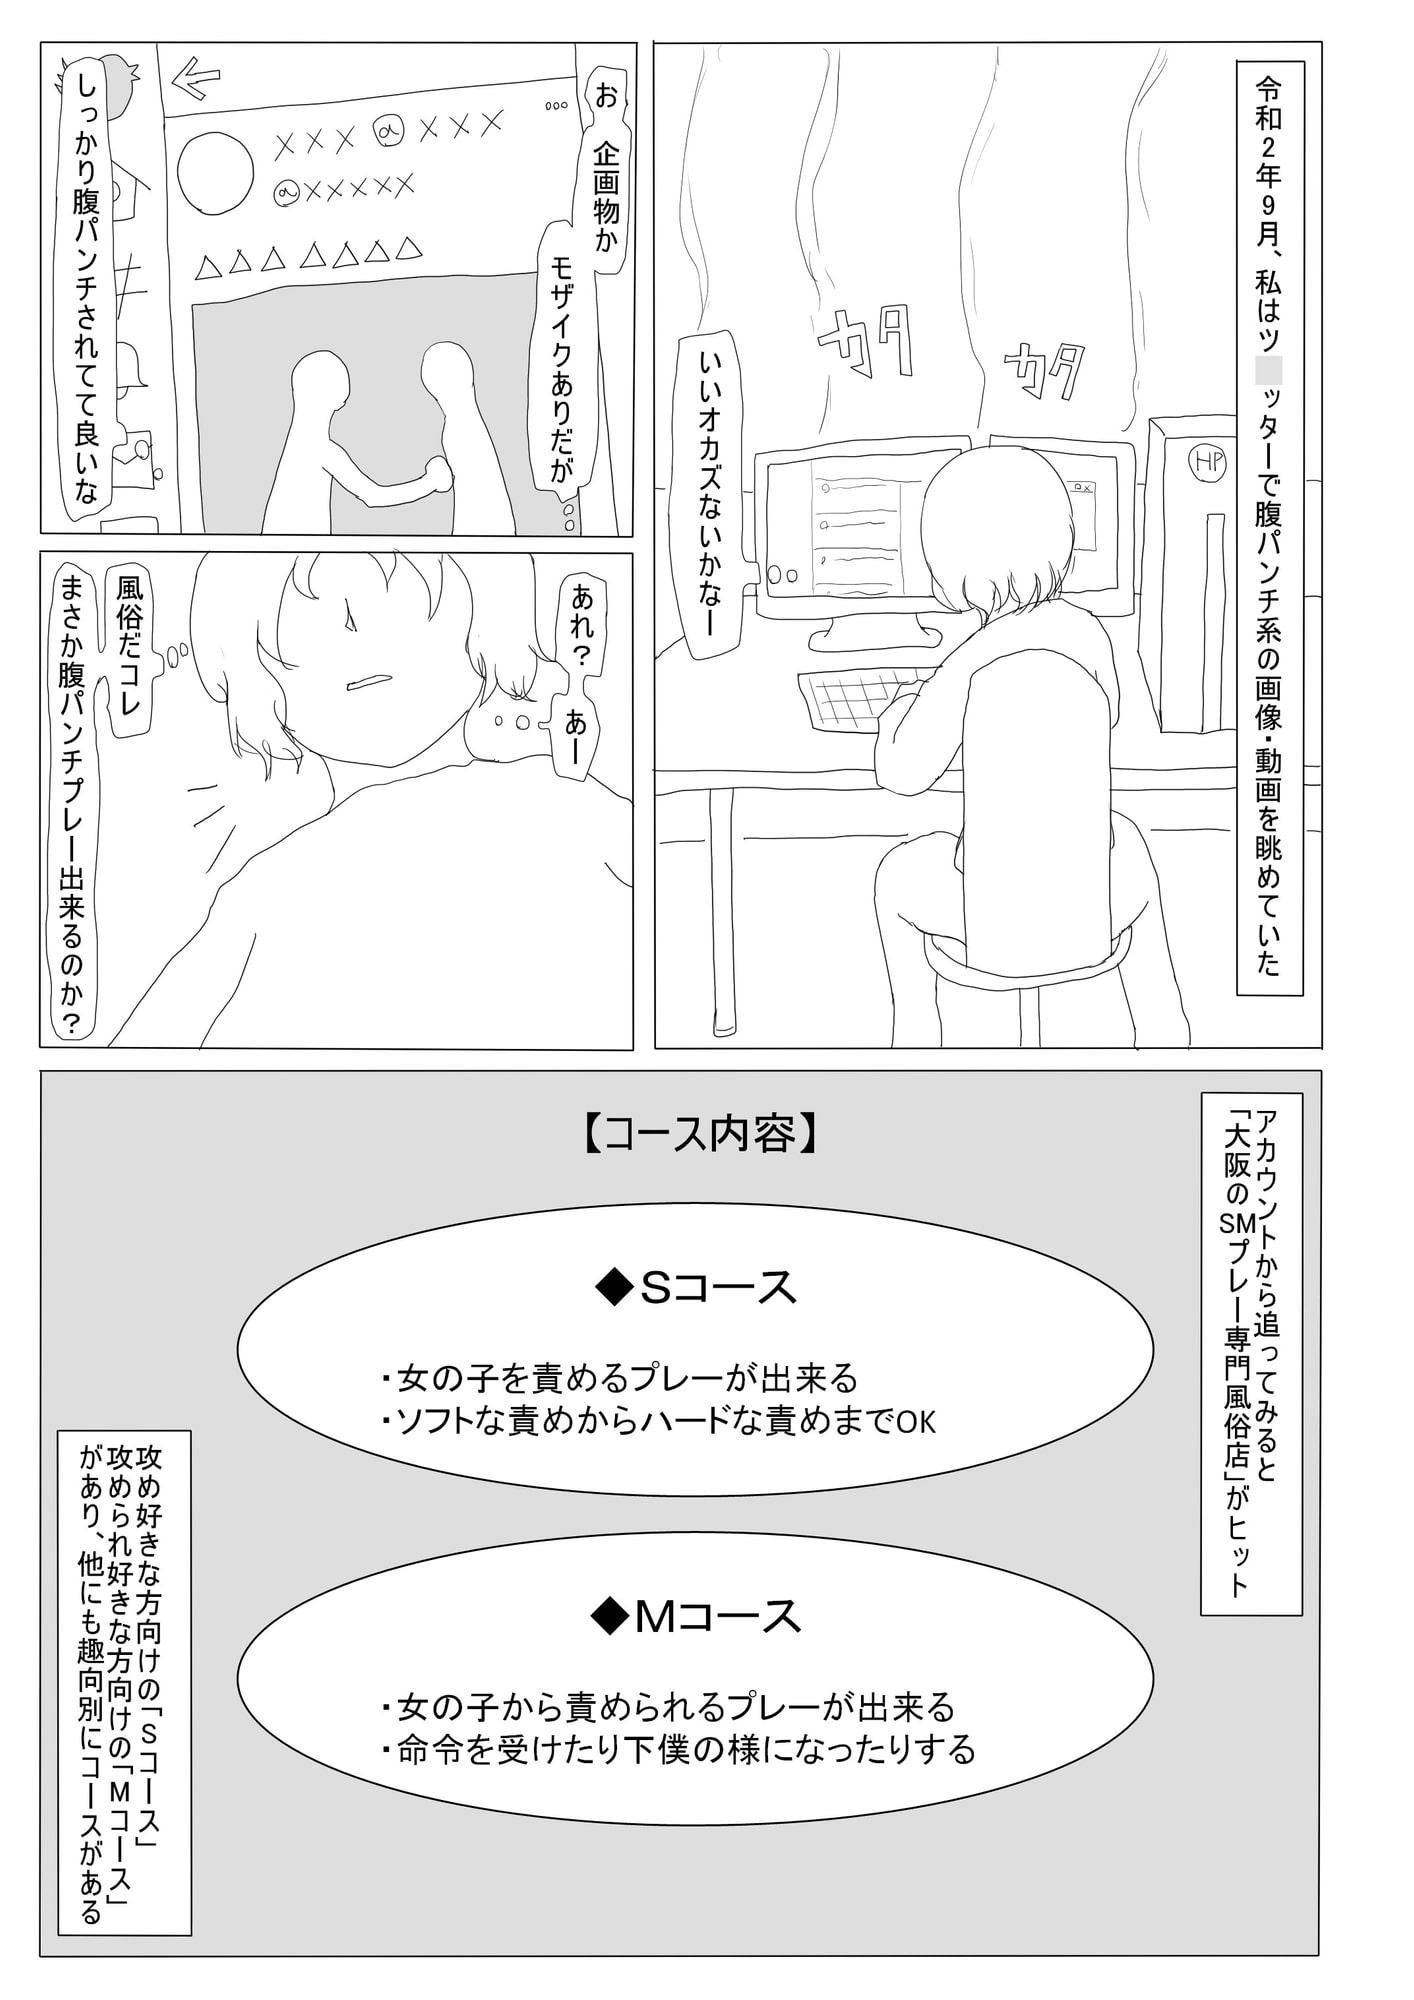 RJ316569 腹パンチ系風俗 レポート漫画 [20210204]